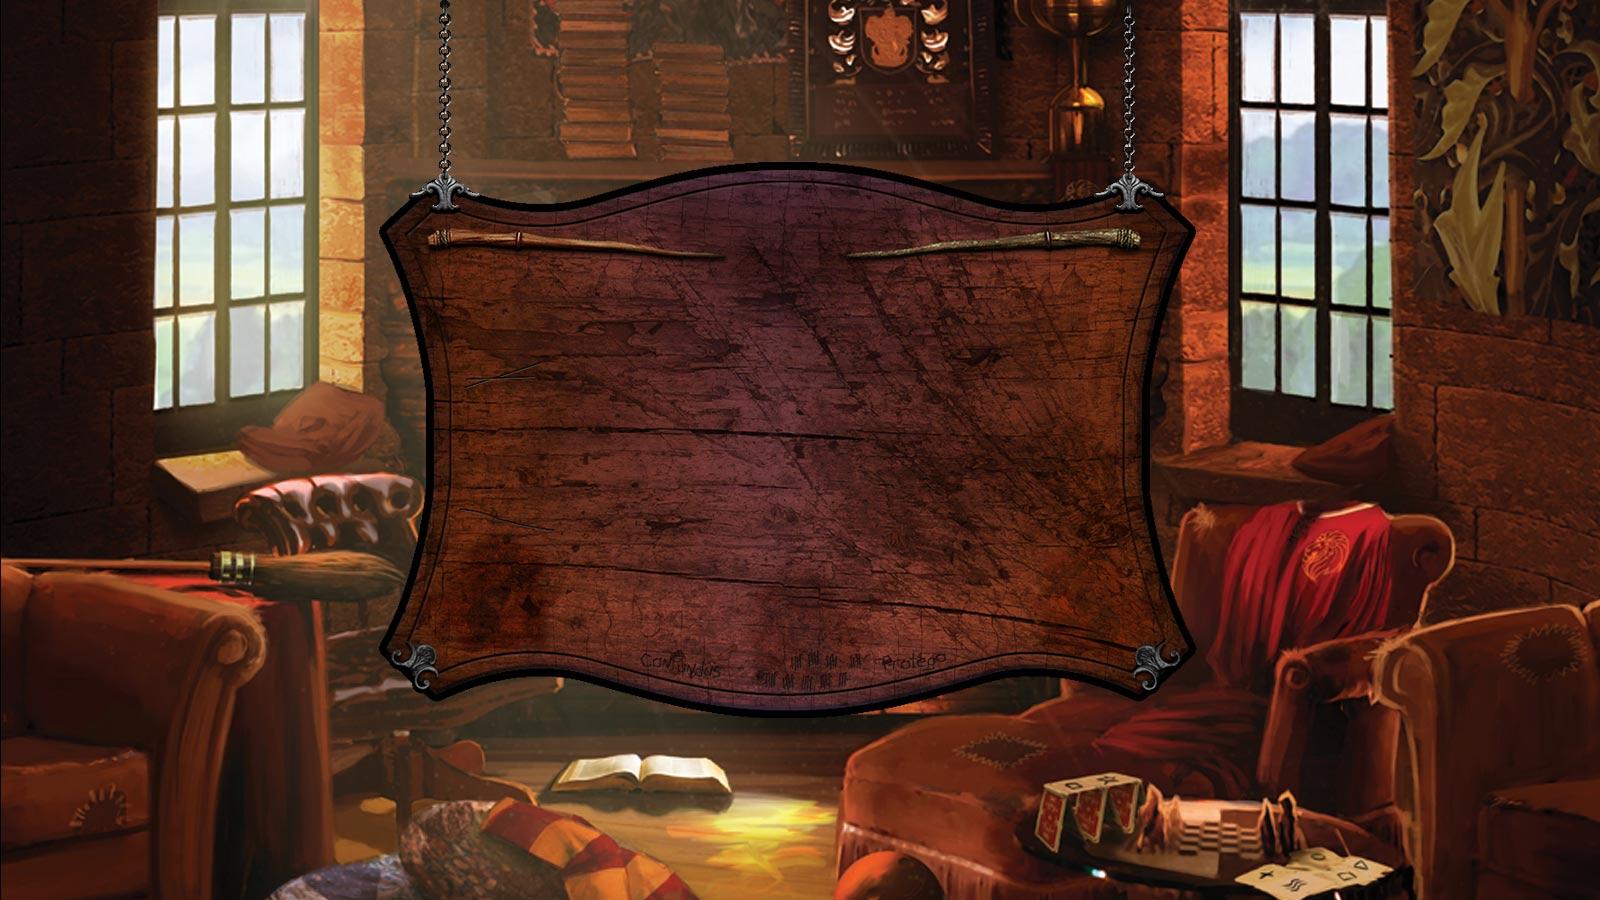 gryffindor common room wallpaper laptop - photo #16